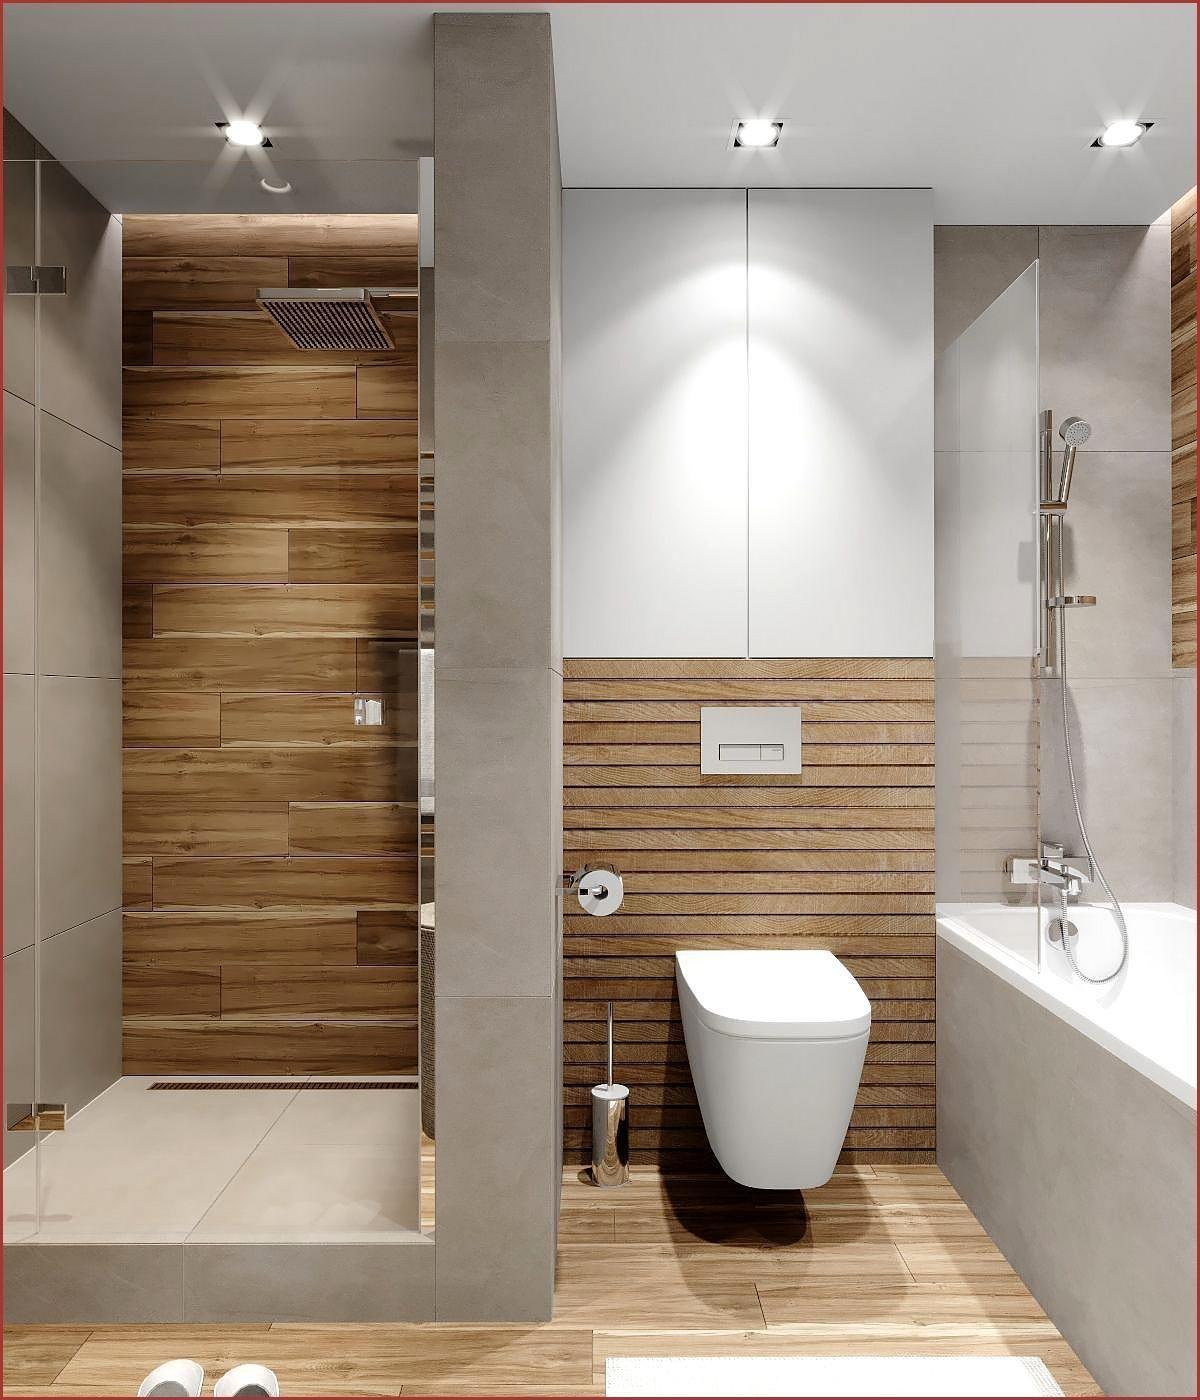 Photo of A B STUDIO DESIGN modernbathrooms #smallbathrooms #bathrooms #bathrooms – My Blog